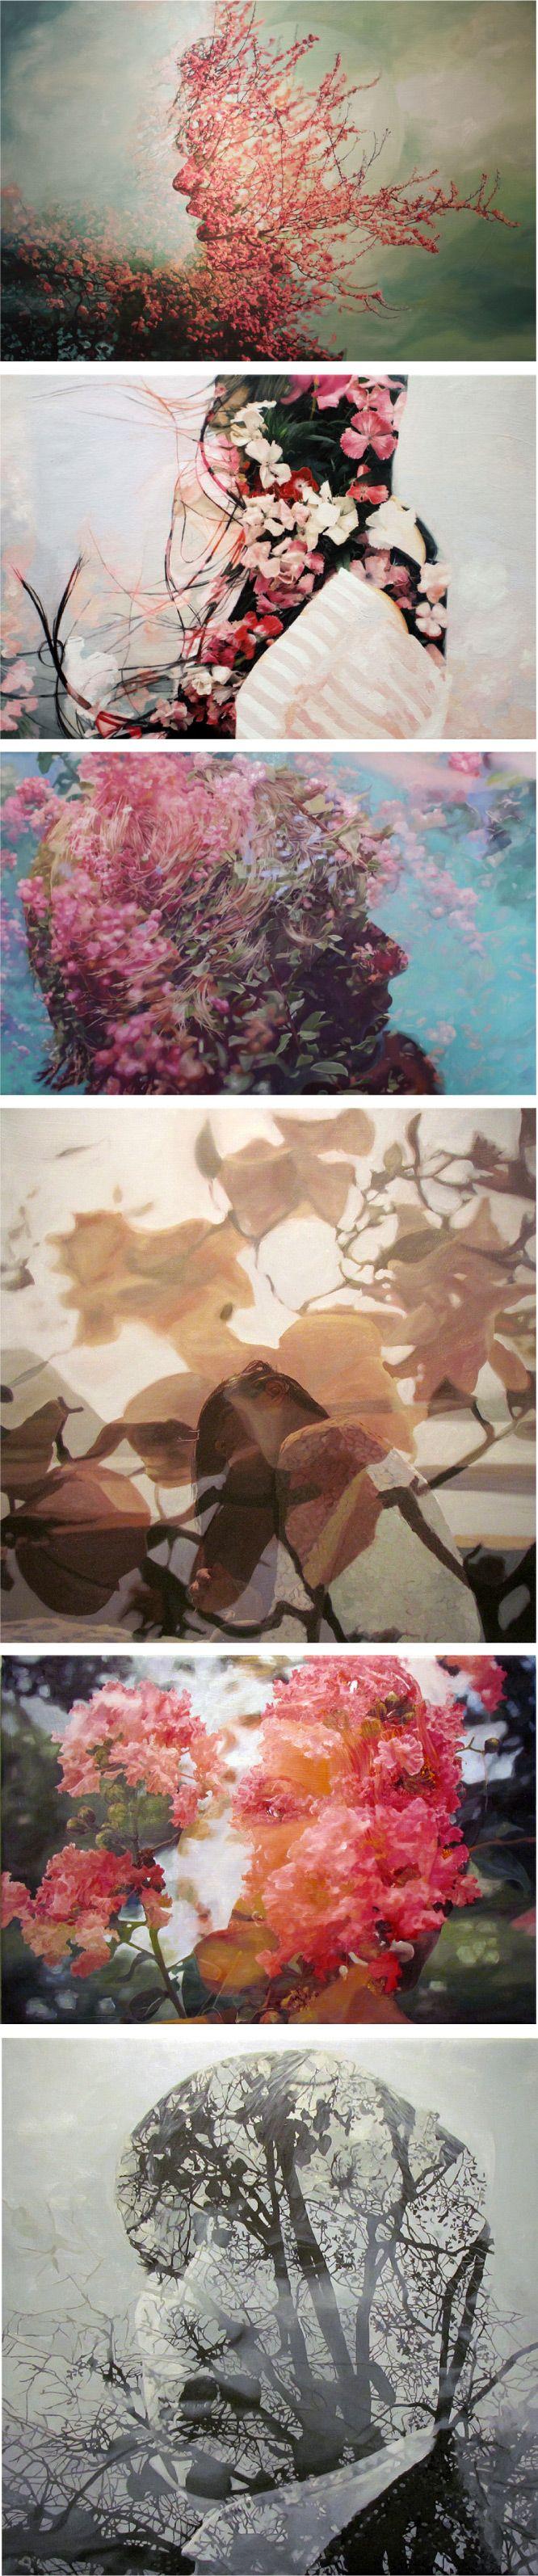 Paintings based on double exposures, by Pakayla Biehn.